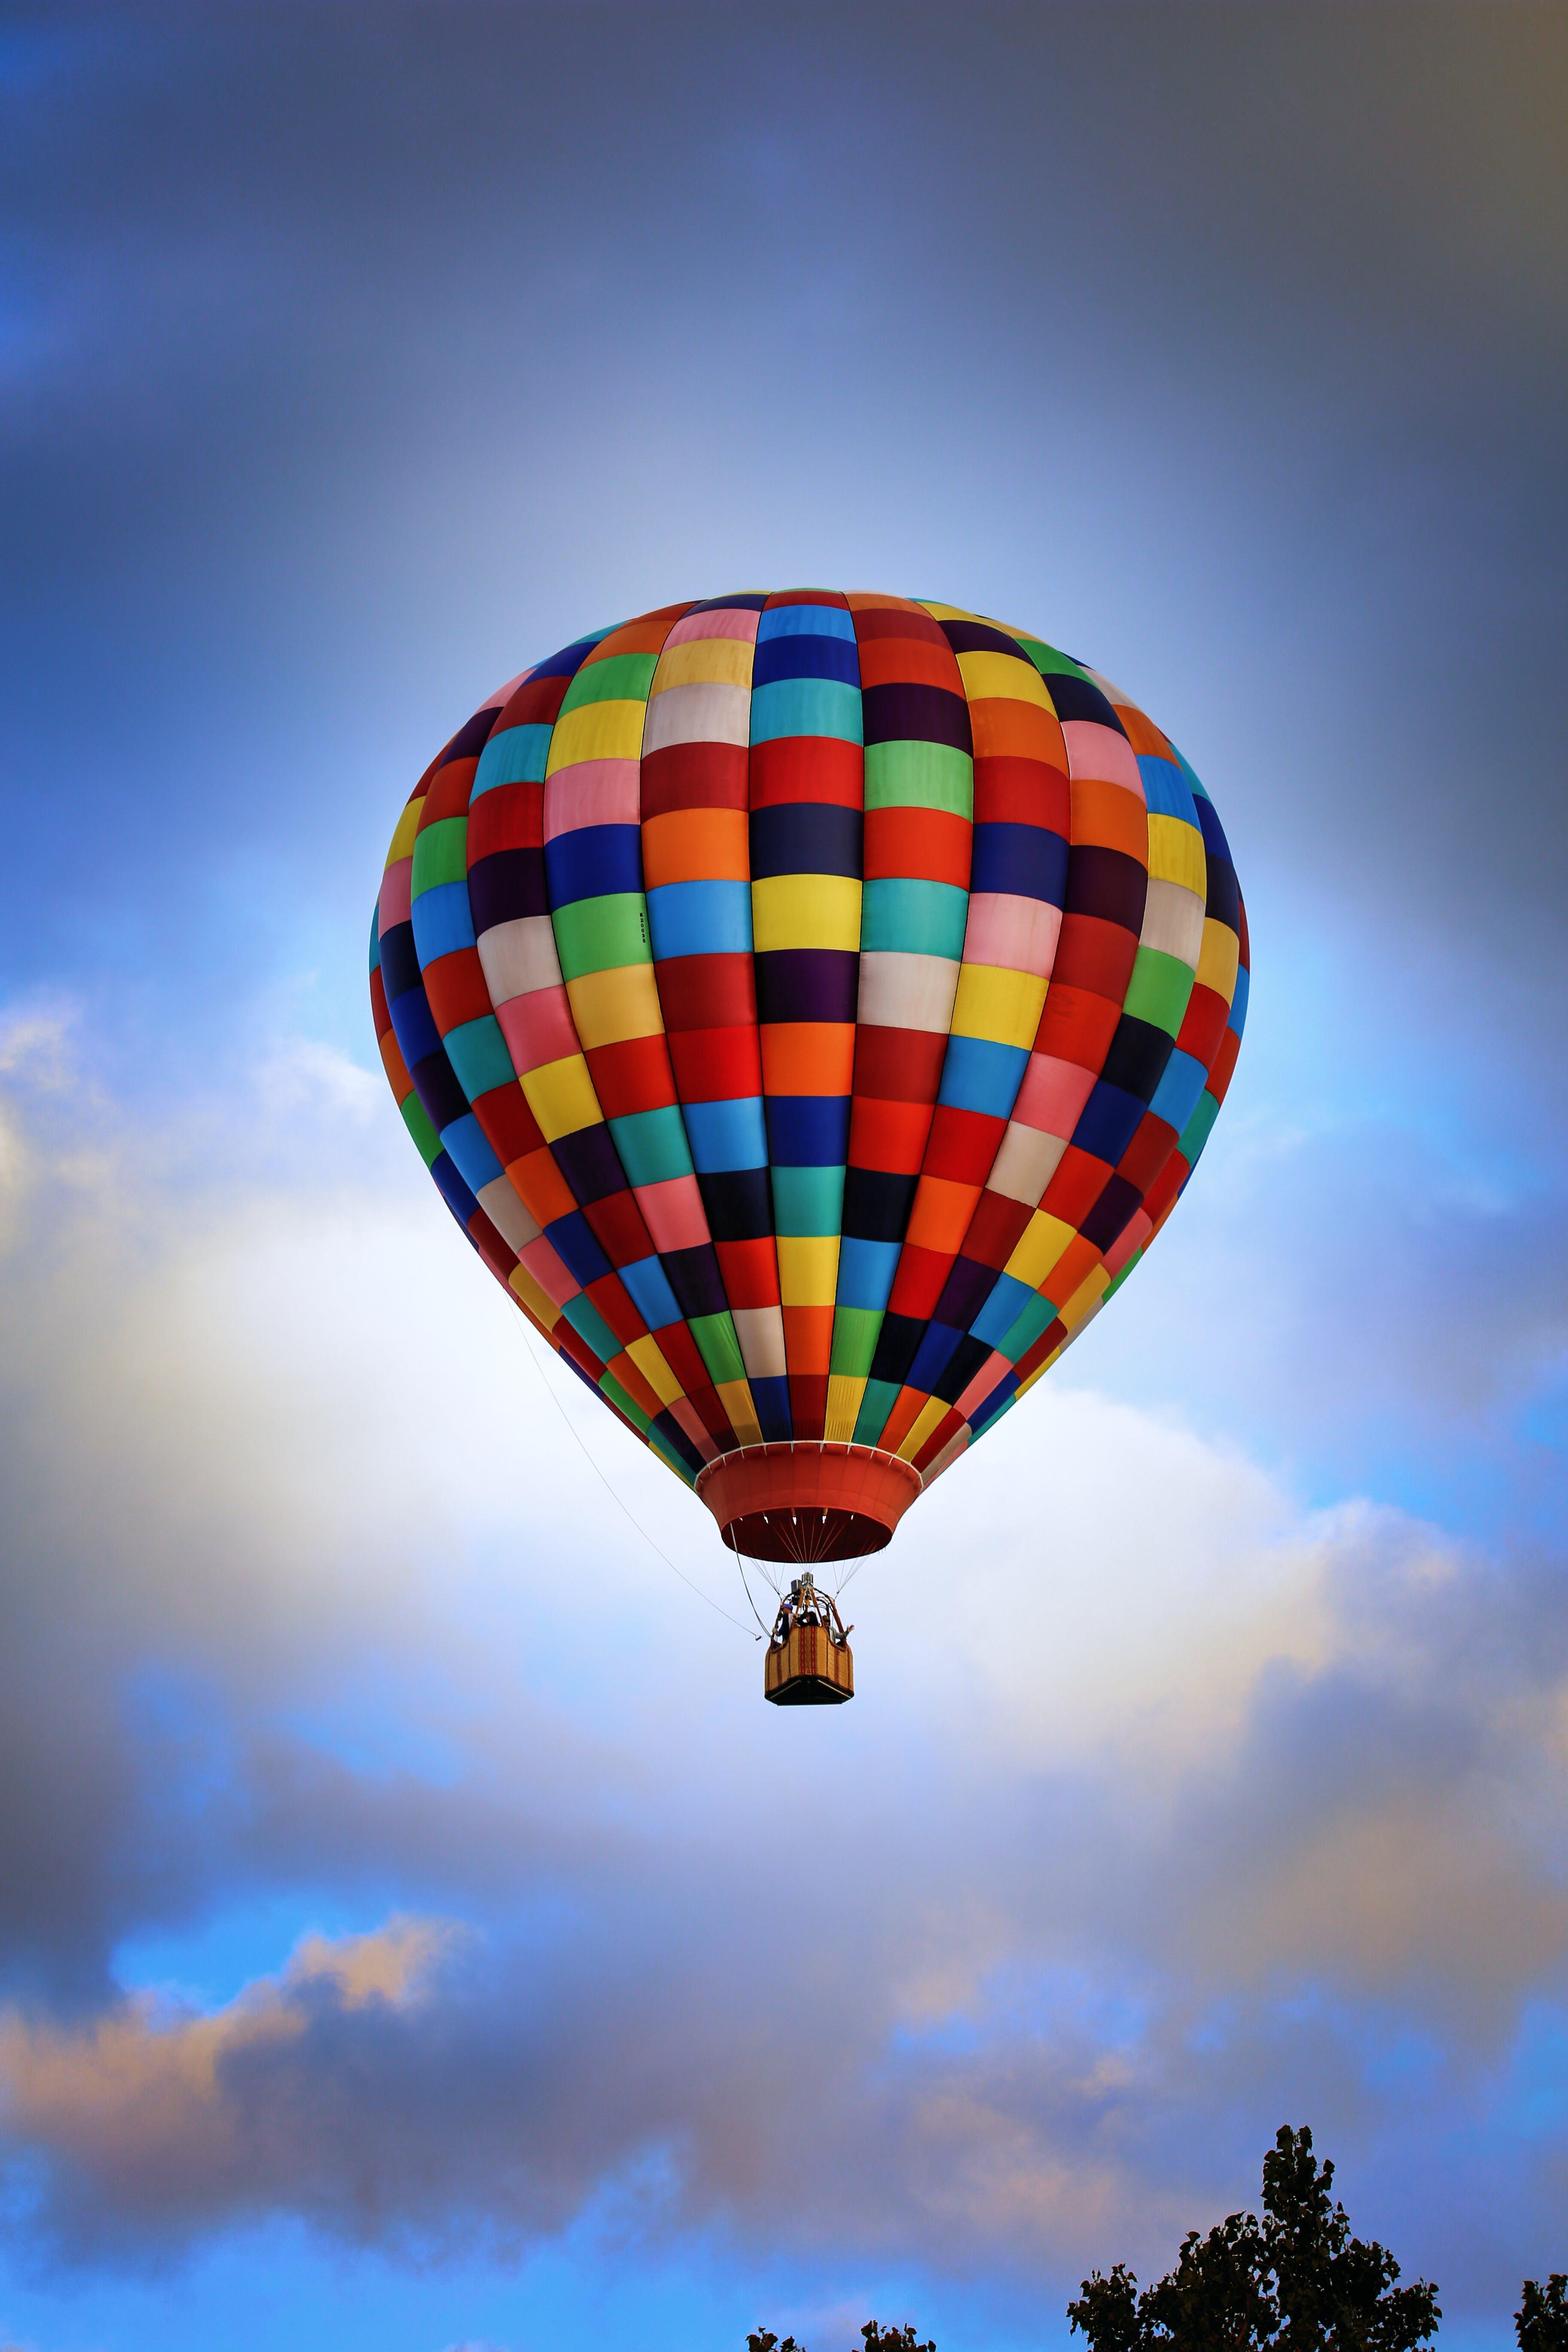 Free stock photo of balloon, colorful, hot air balloon